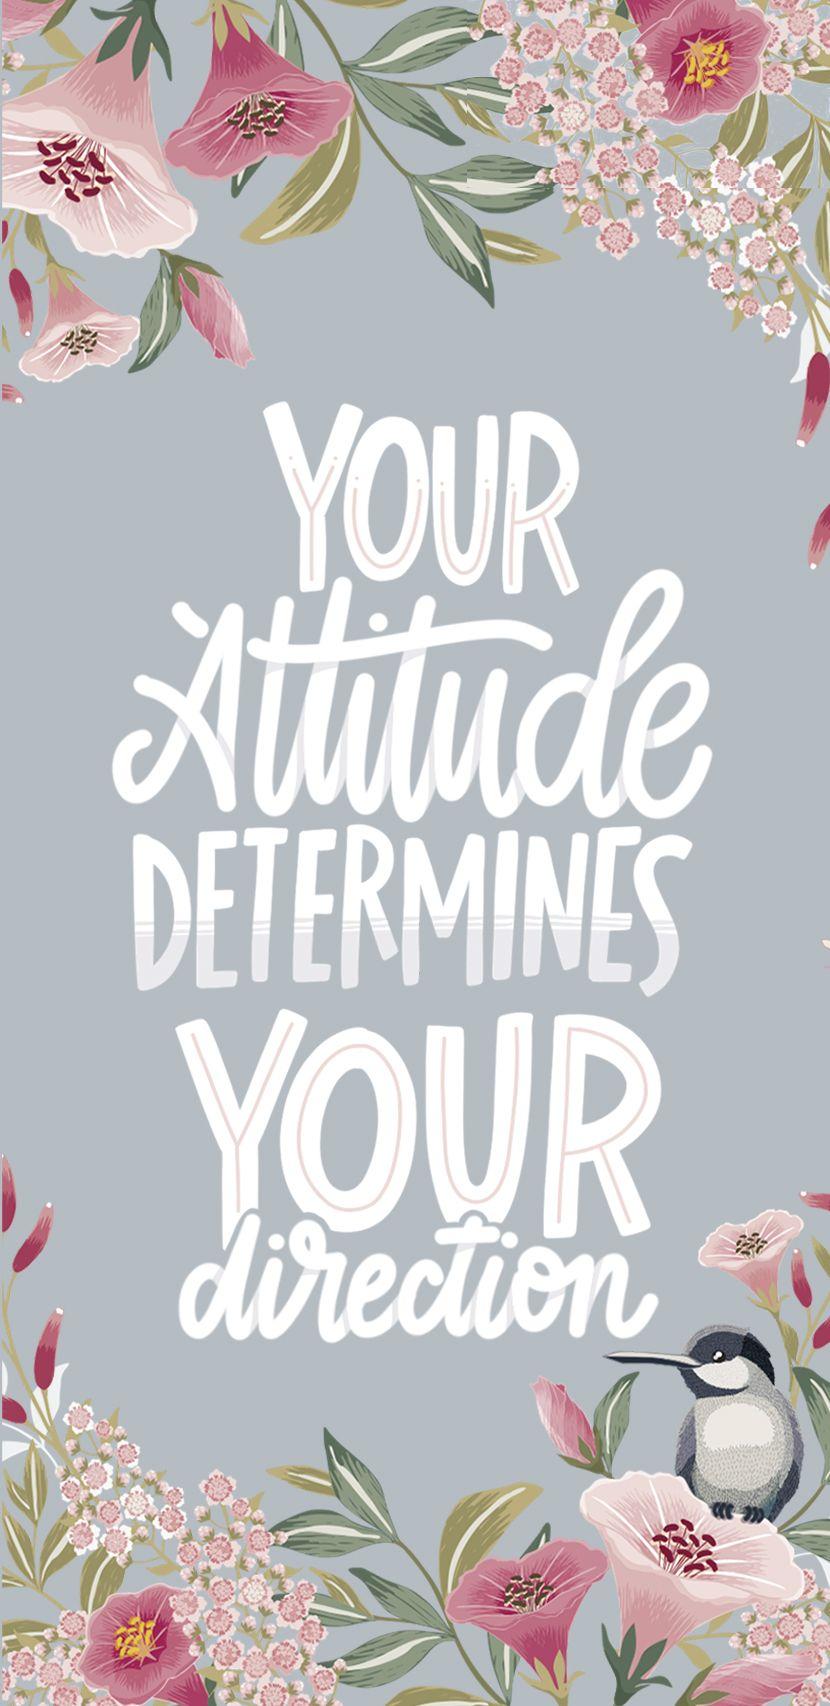 Motivational Wallpaper Motivational Wallpaper Motivational Wallpaper Iphone Motivational Quotes Wallpaper